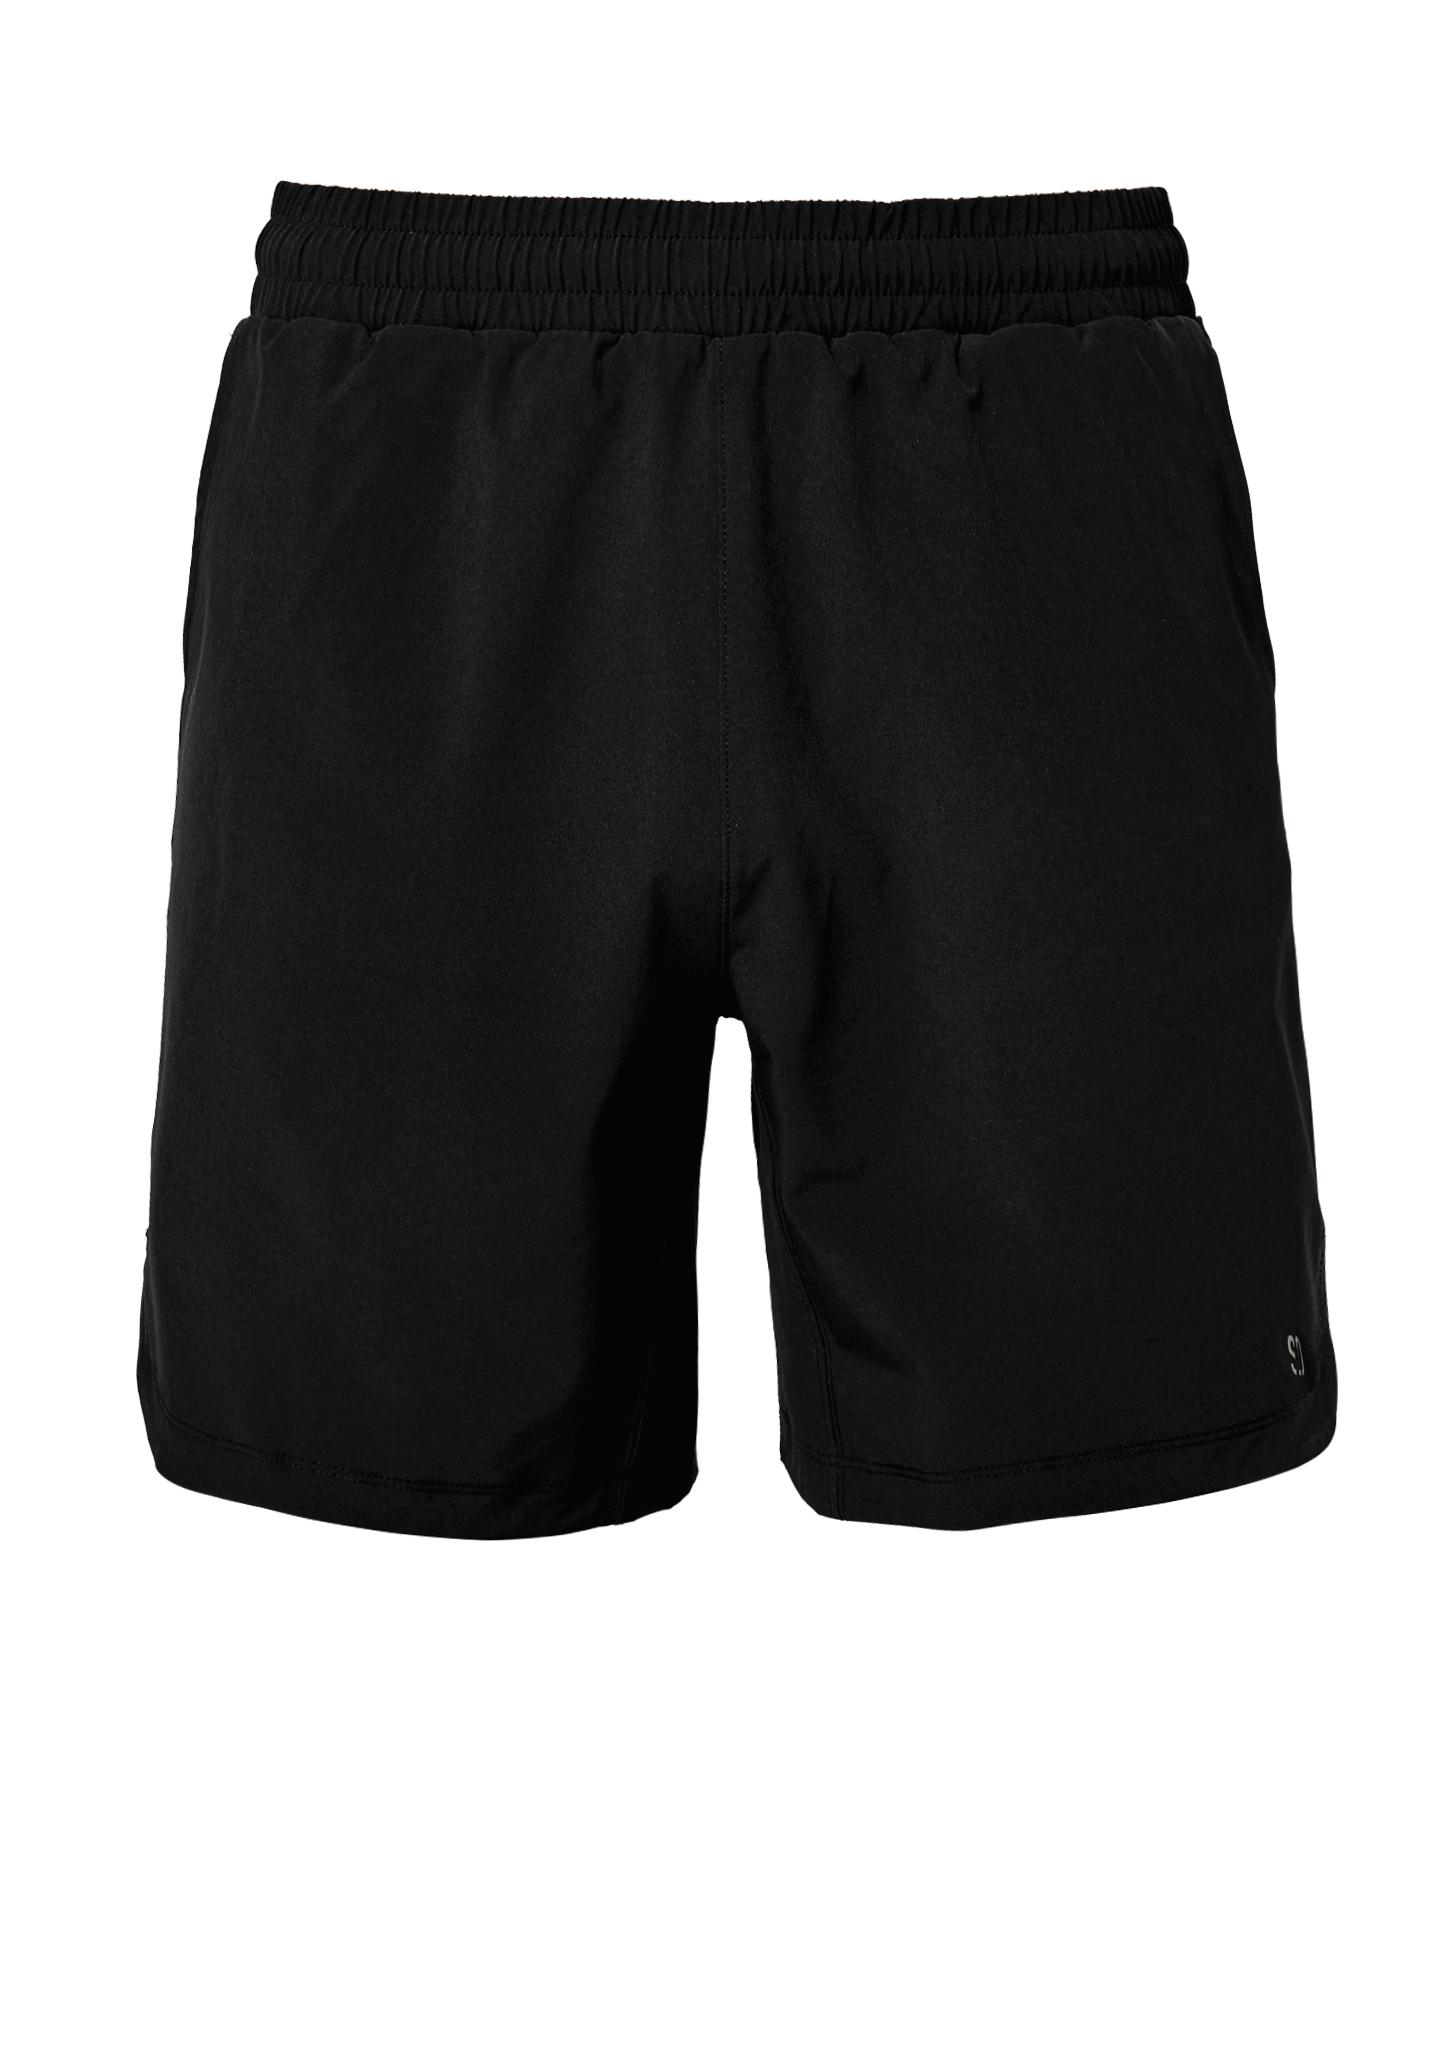 Trainingsshorts   Bekleidung > Shorts & Bermudas   Grau/schwarz   88% polyester -  12% elasthan   s.Oliver ACTIVE